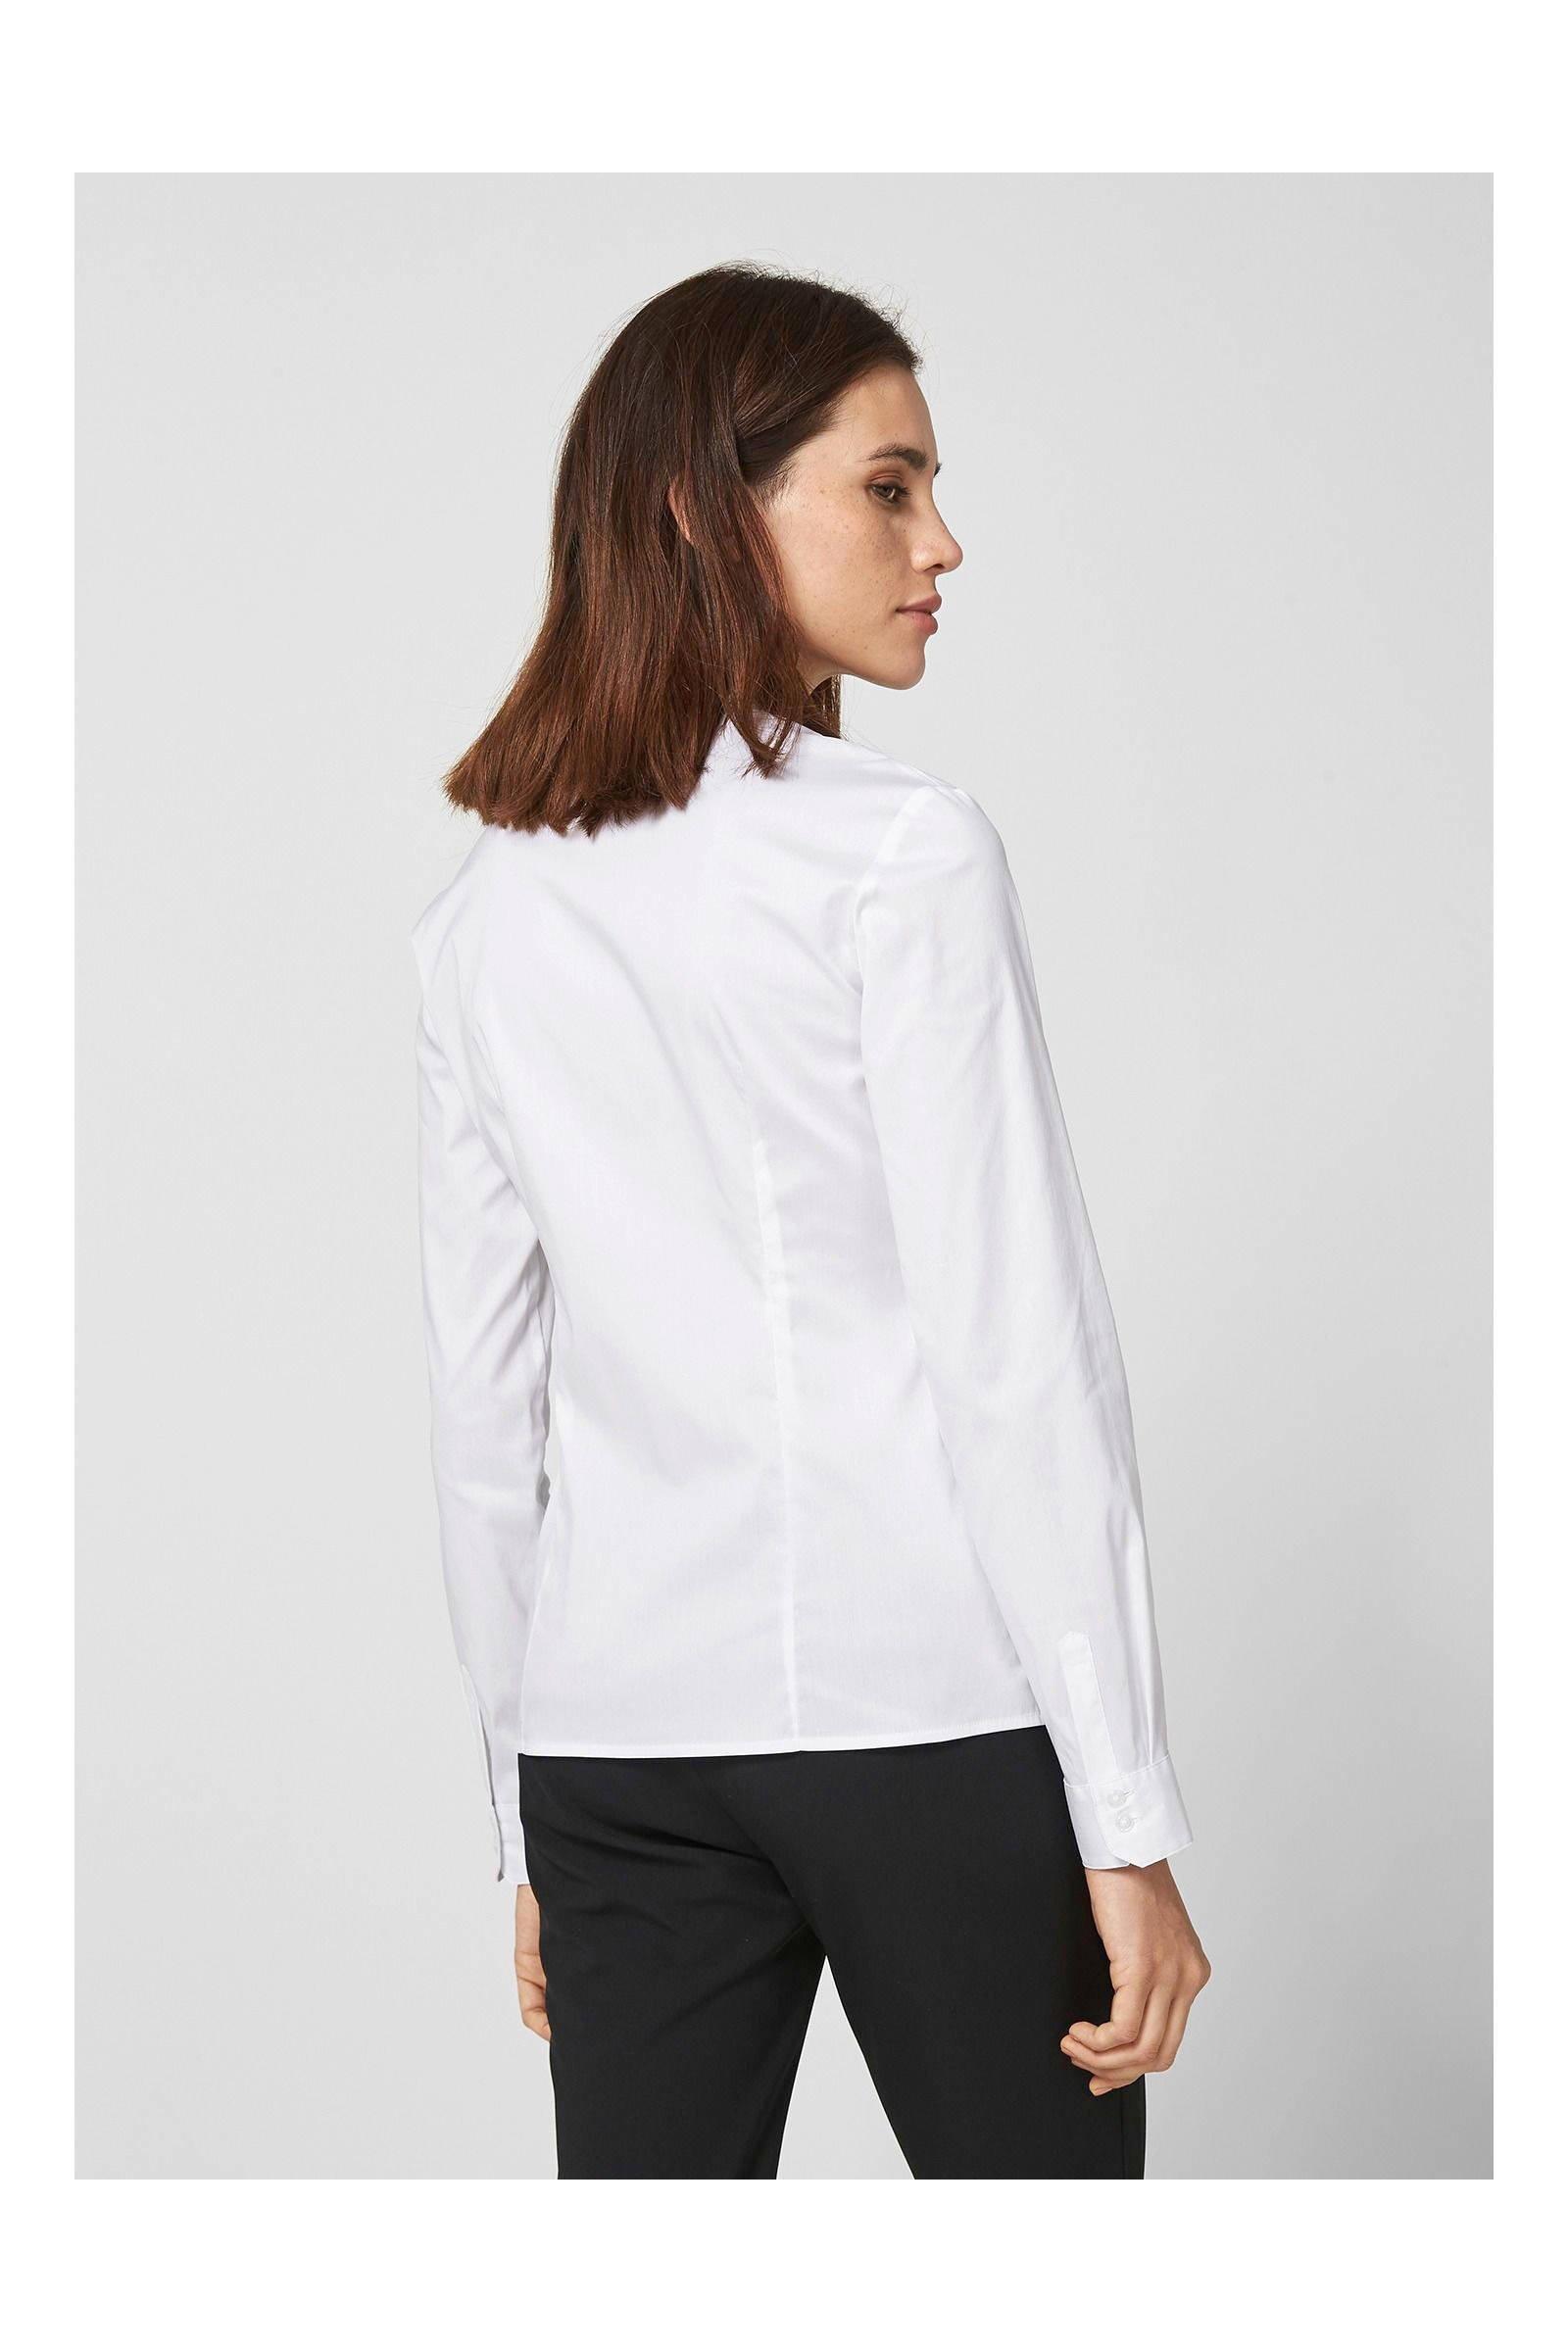 Oliver s BLACK wit verborgen LABEL overhemd met knooplijst xTwqxrRU